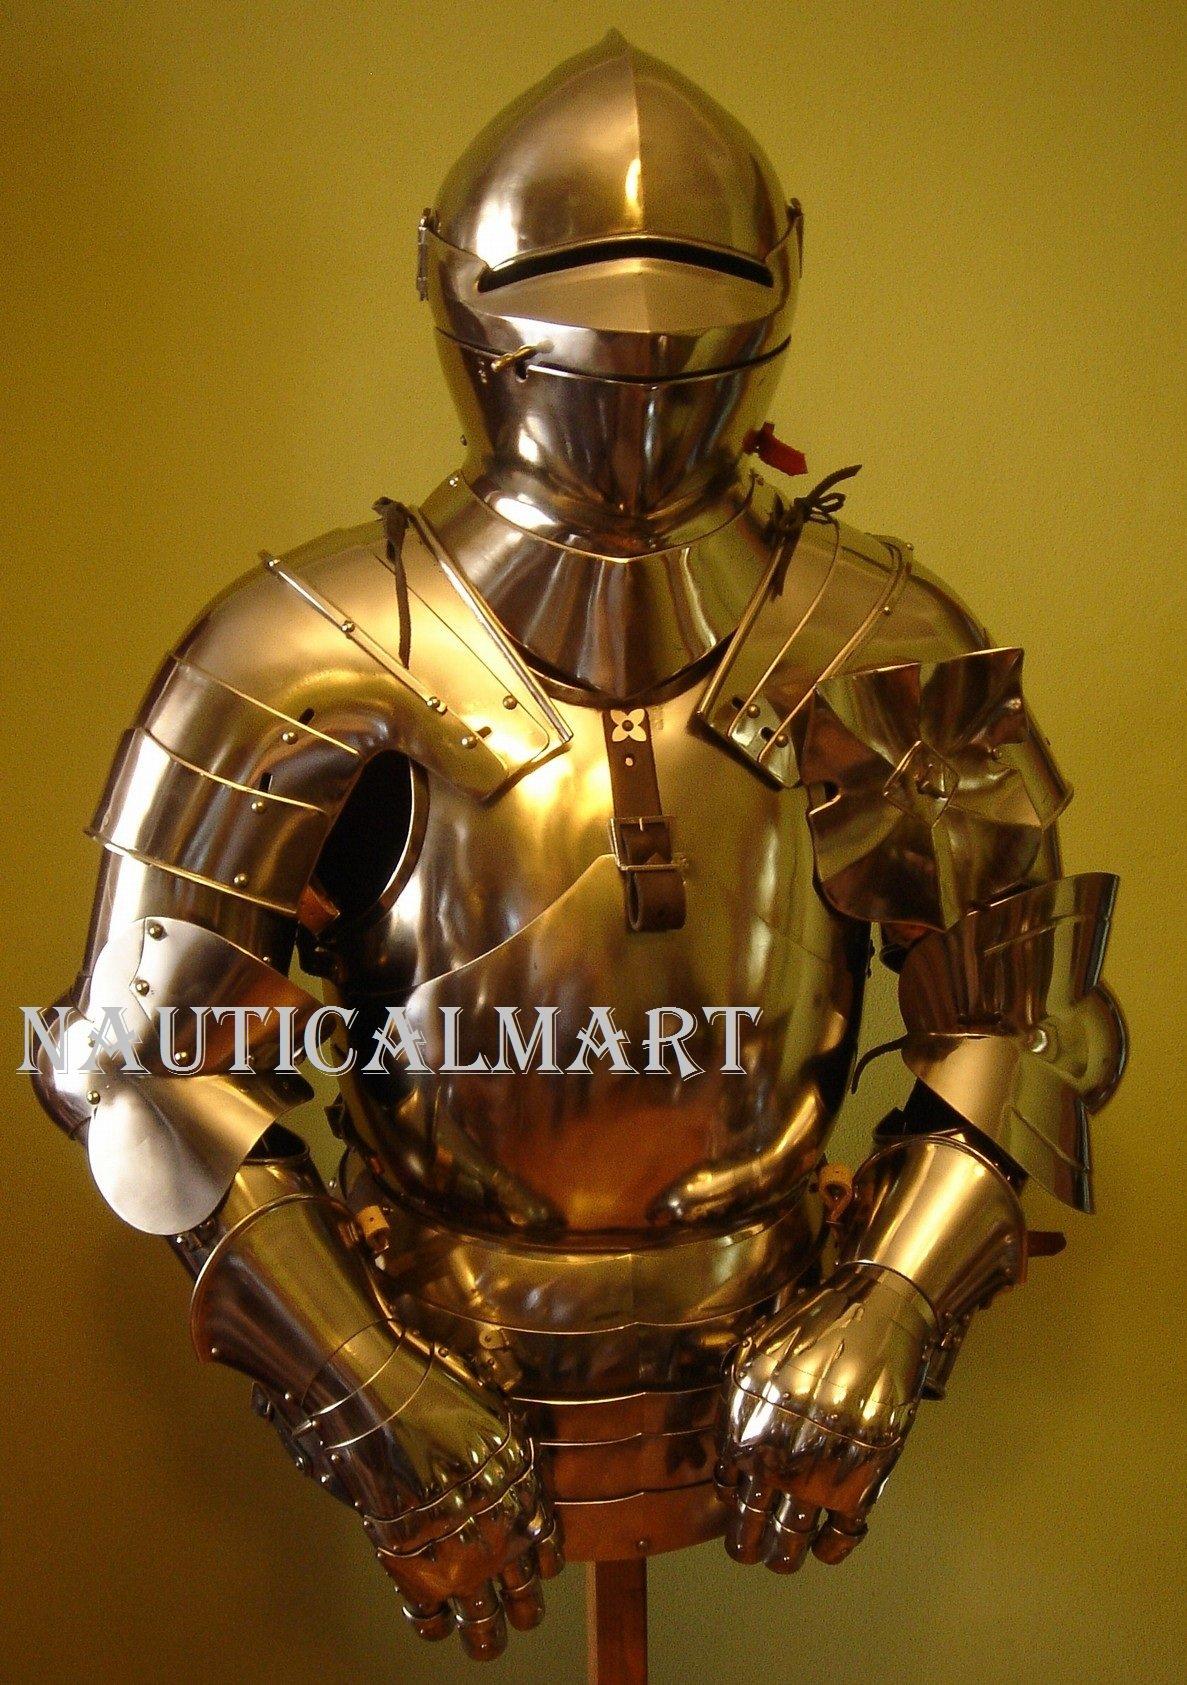 Armor Costume Steel Medieval Suit of Armor Breastplate with Helmet